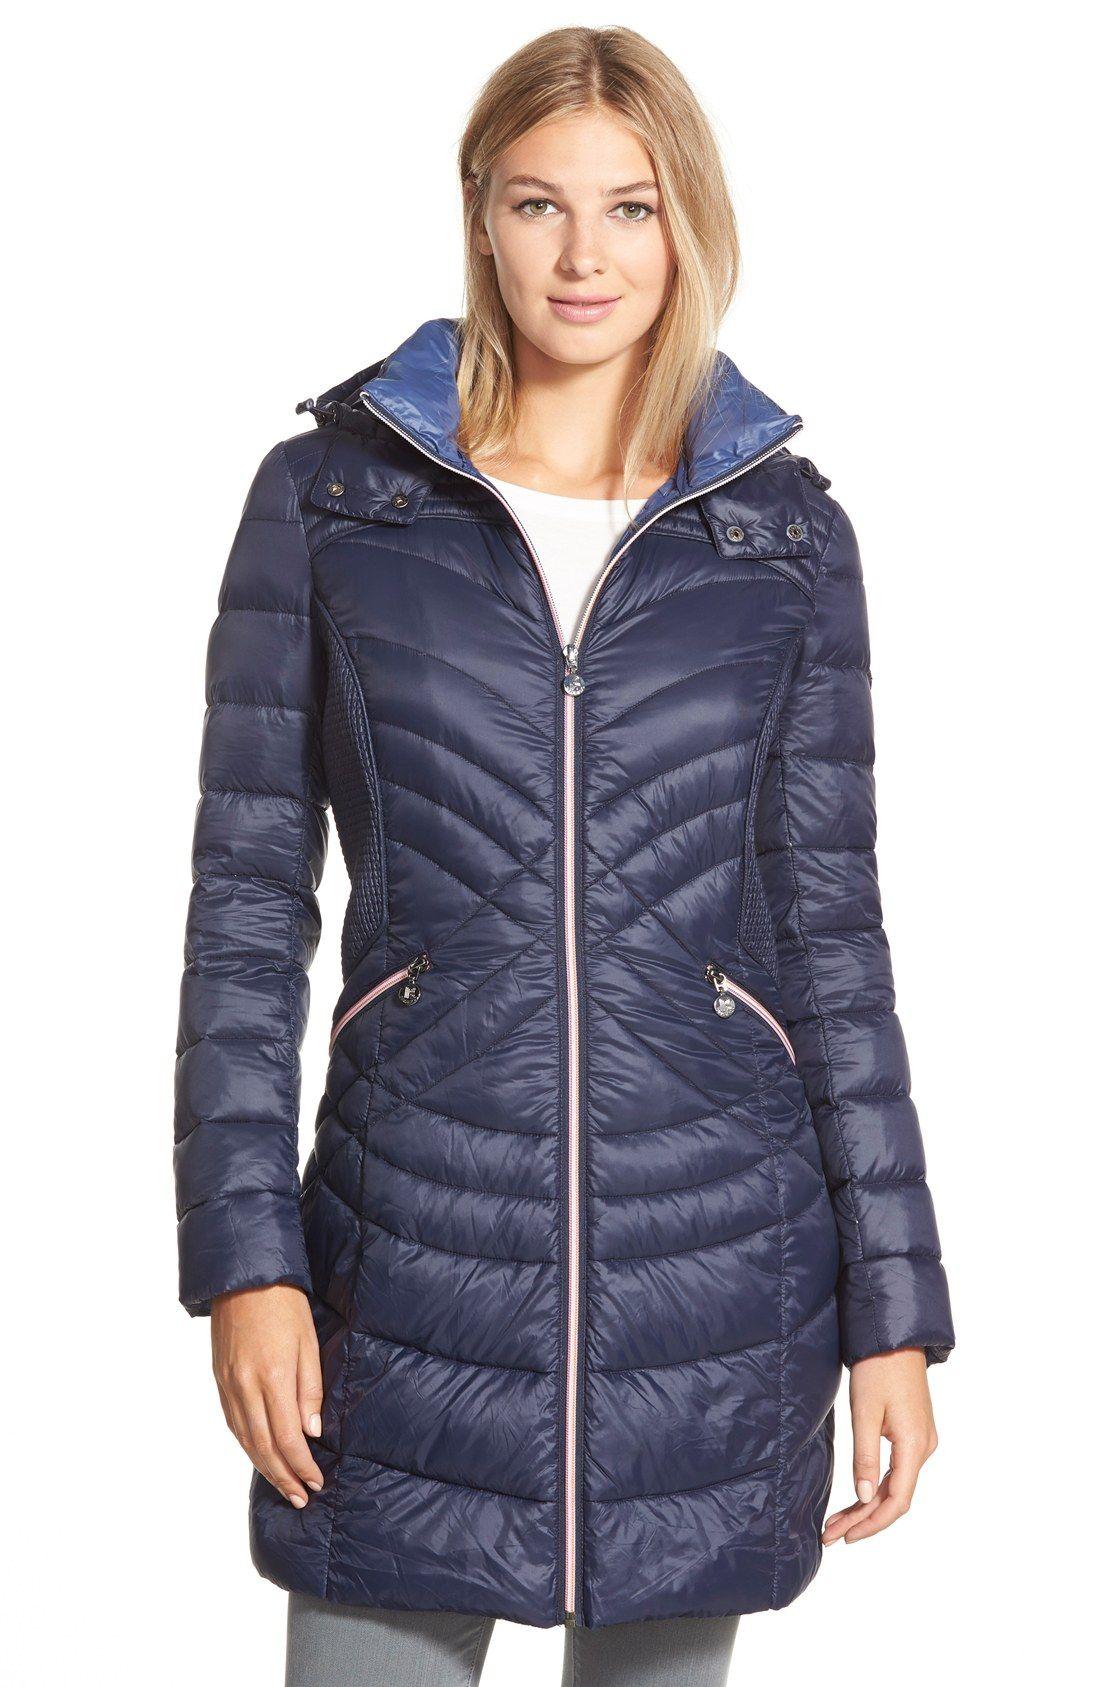 Bernardo Hooded Down Primaloft Fill Coat Regular Petite Nordstrom Nordstrom Coats Coats For Women Quilted Outerwear [ 1687 x 1100 Pixel ]